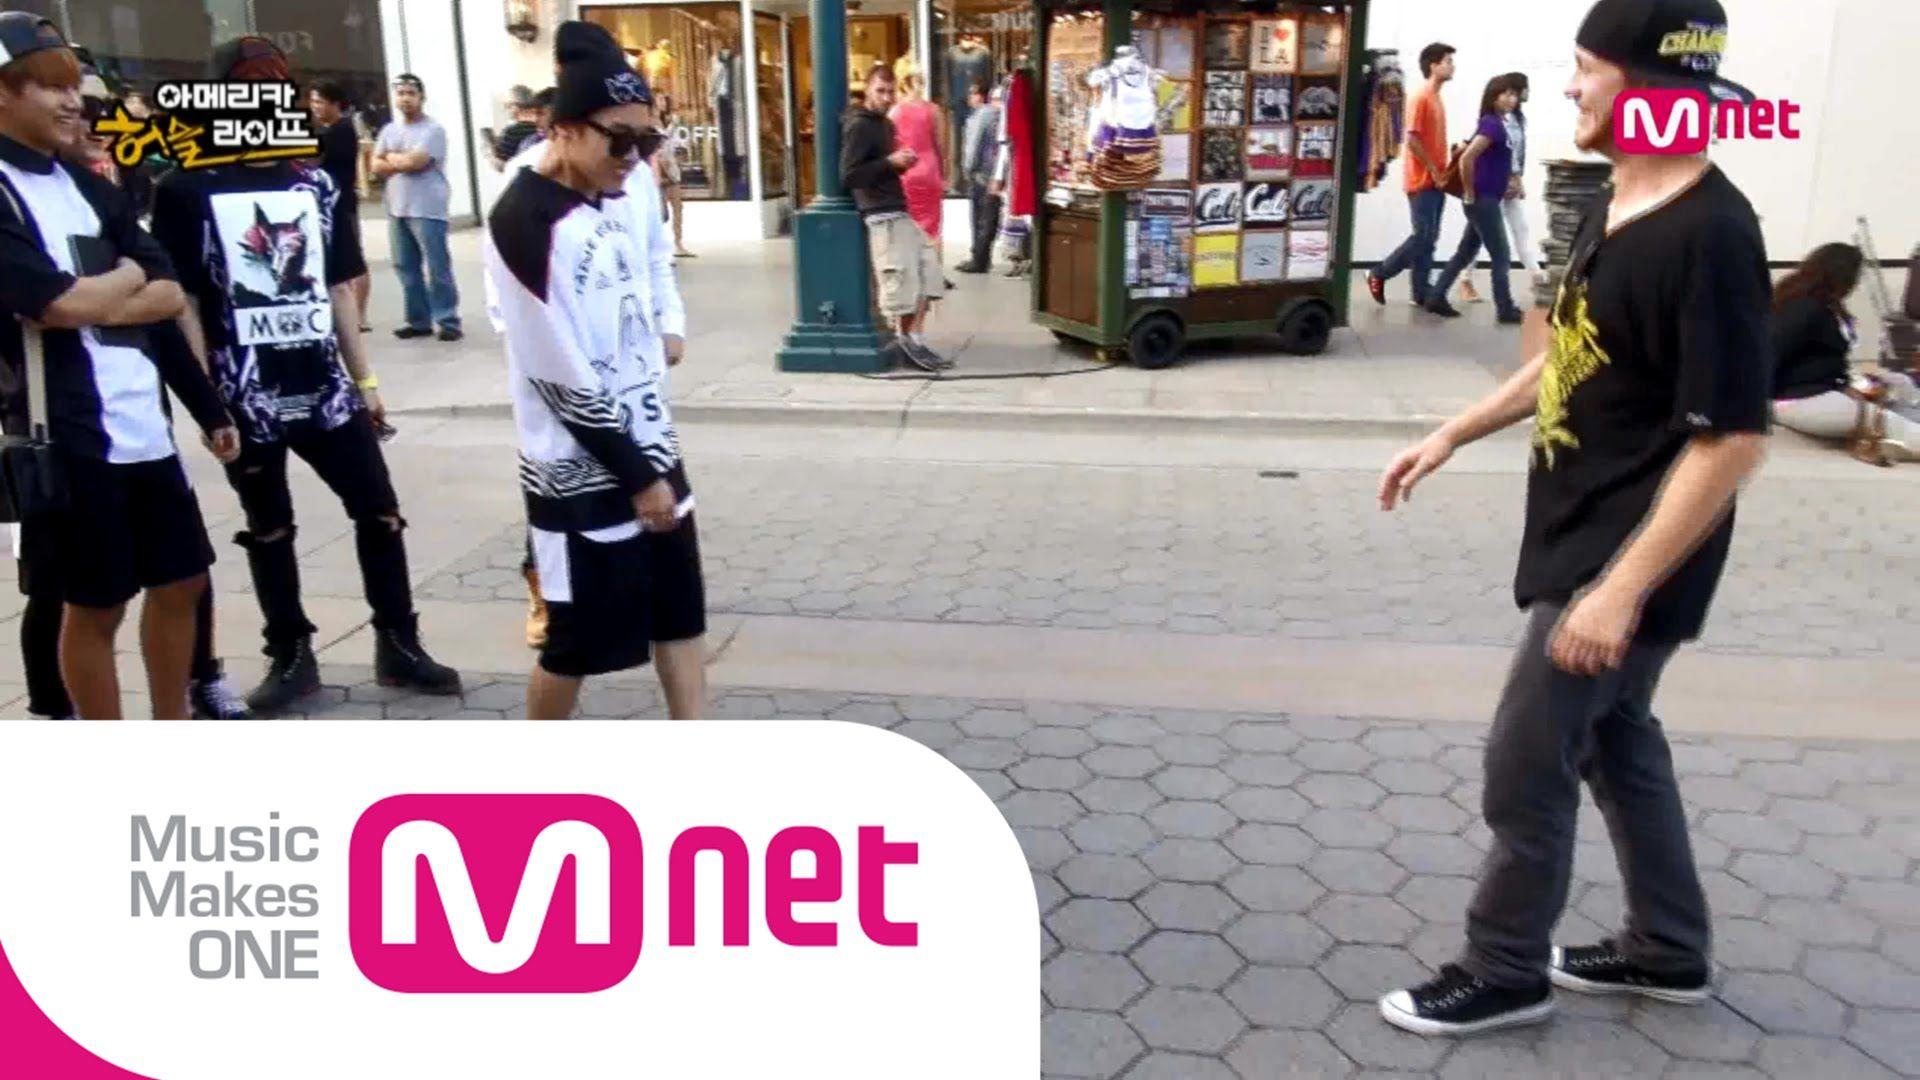 [BTS의 아메리칸허슬라이프] 미공개영상 - 방탄소년단 제이홉 vs 미국 거리의 댄서(No Cut) #BTS #방탄소년단